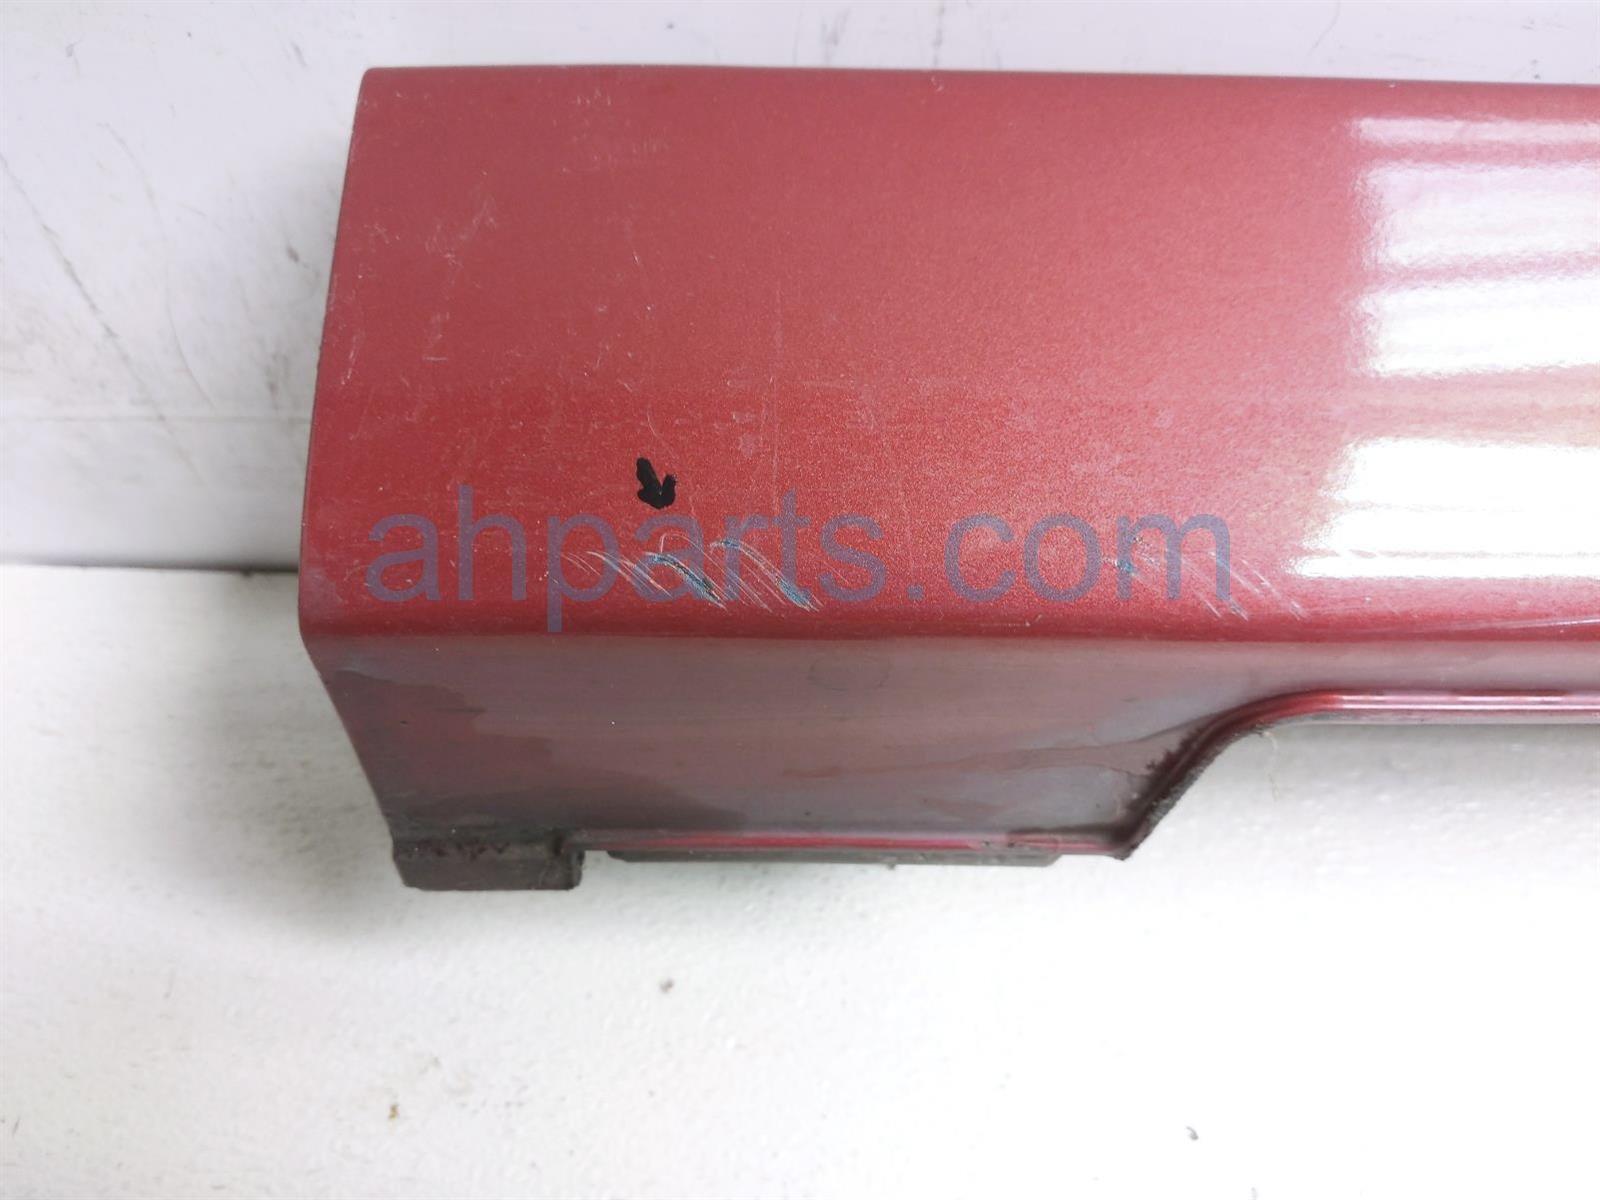 2007 Honda Accord Rocker Trim Passenger Side Skirt / Molding   Red 71800 SDA A11ZS Replacement